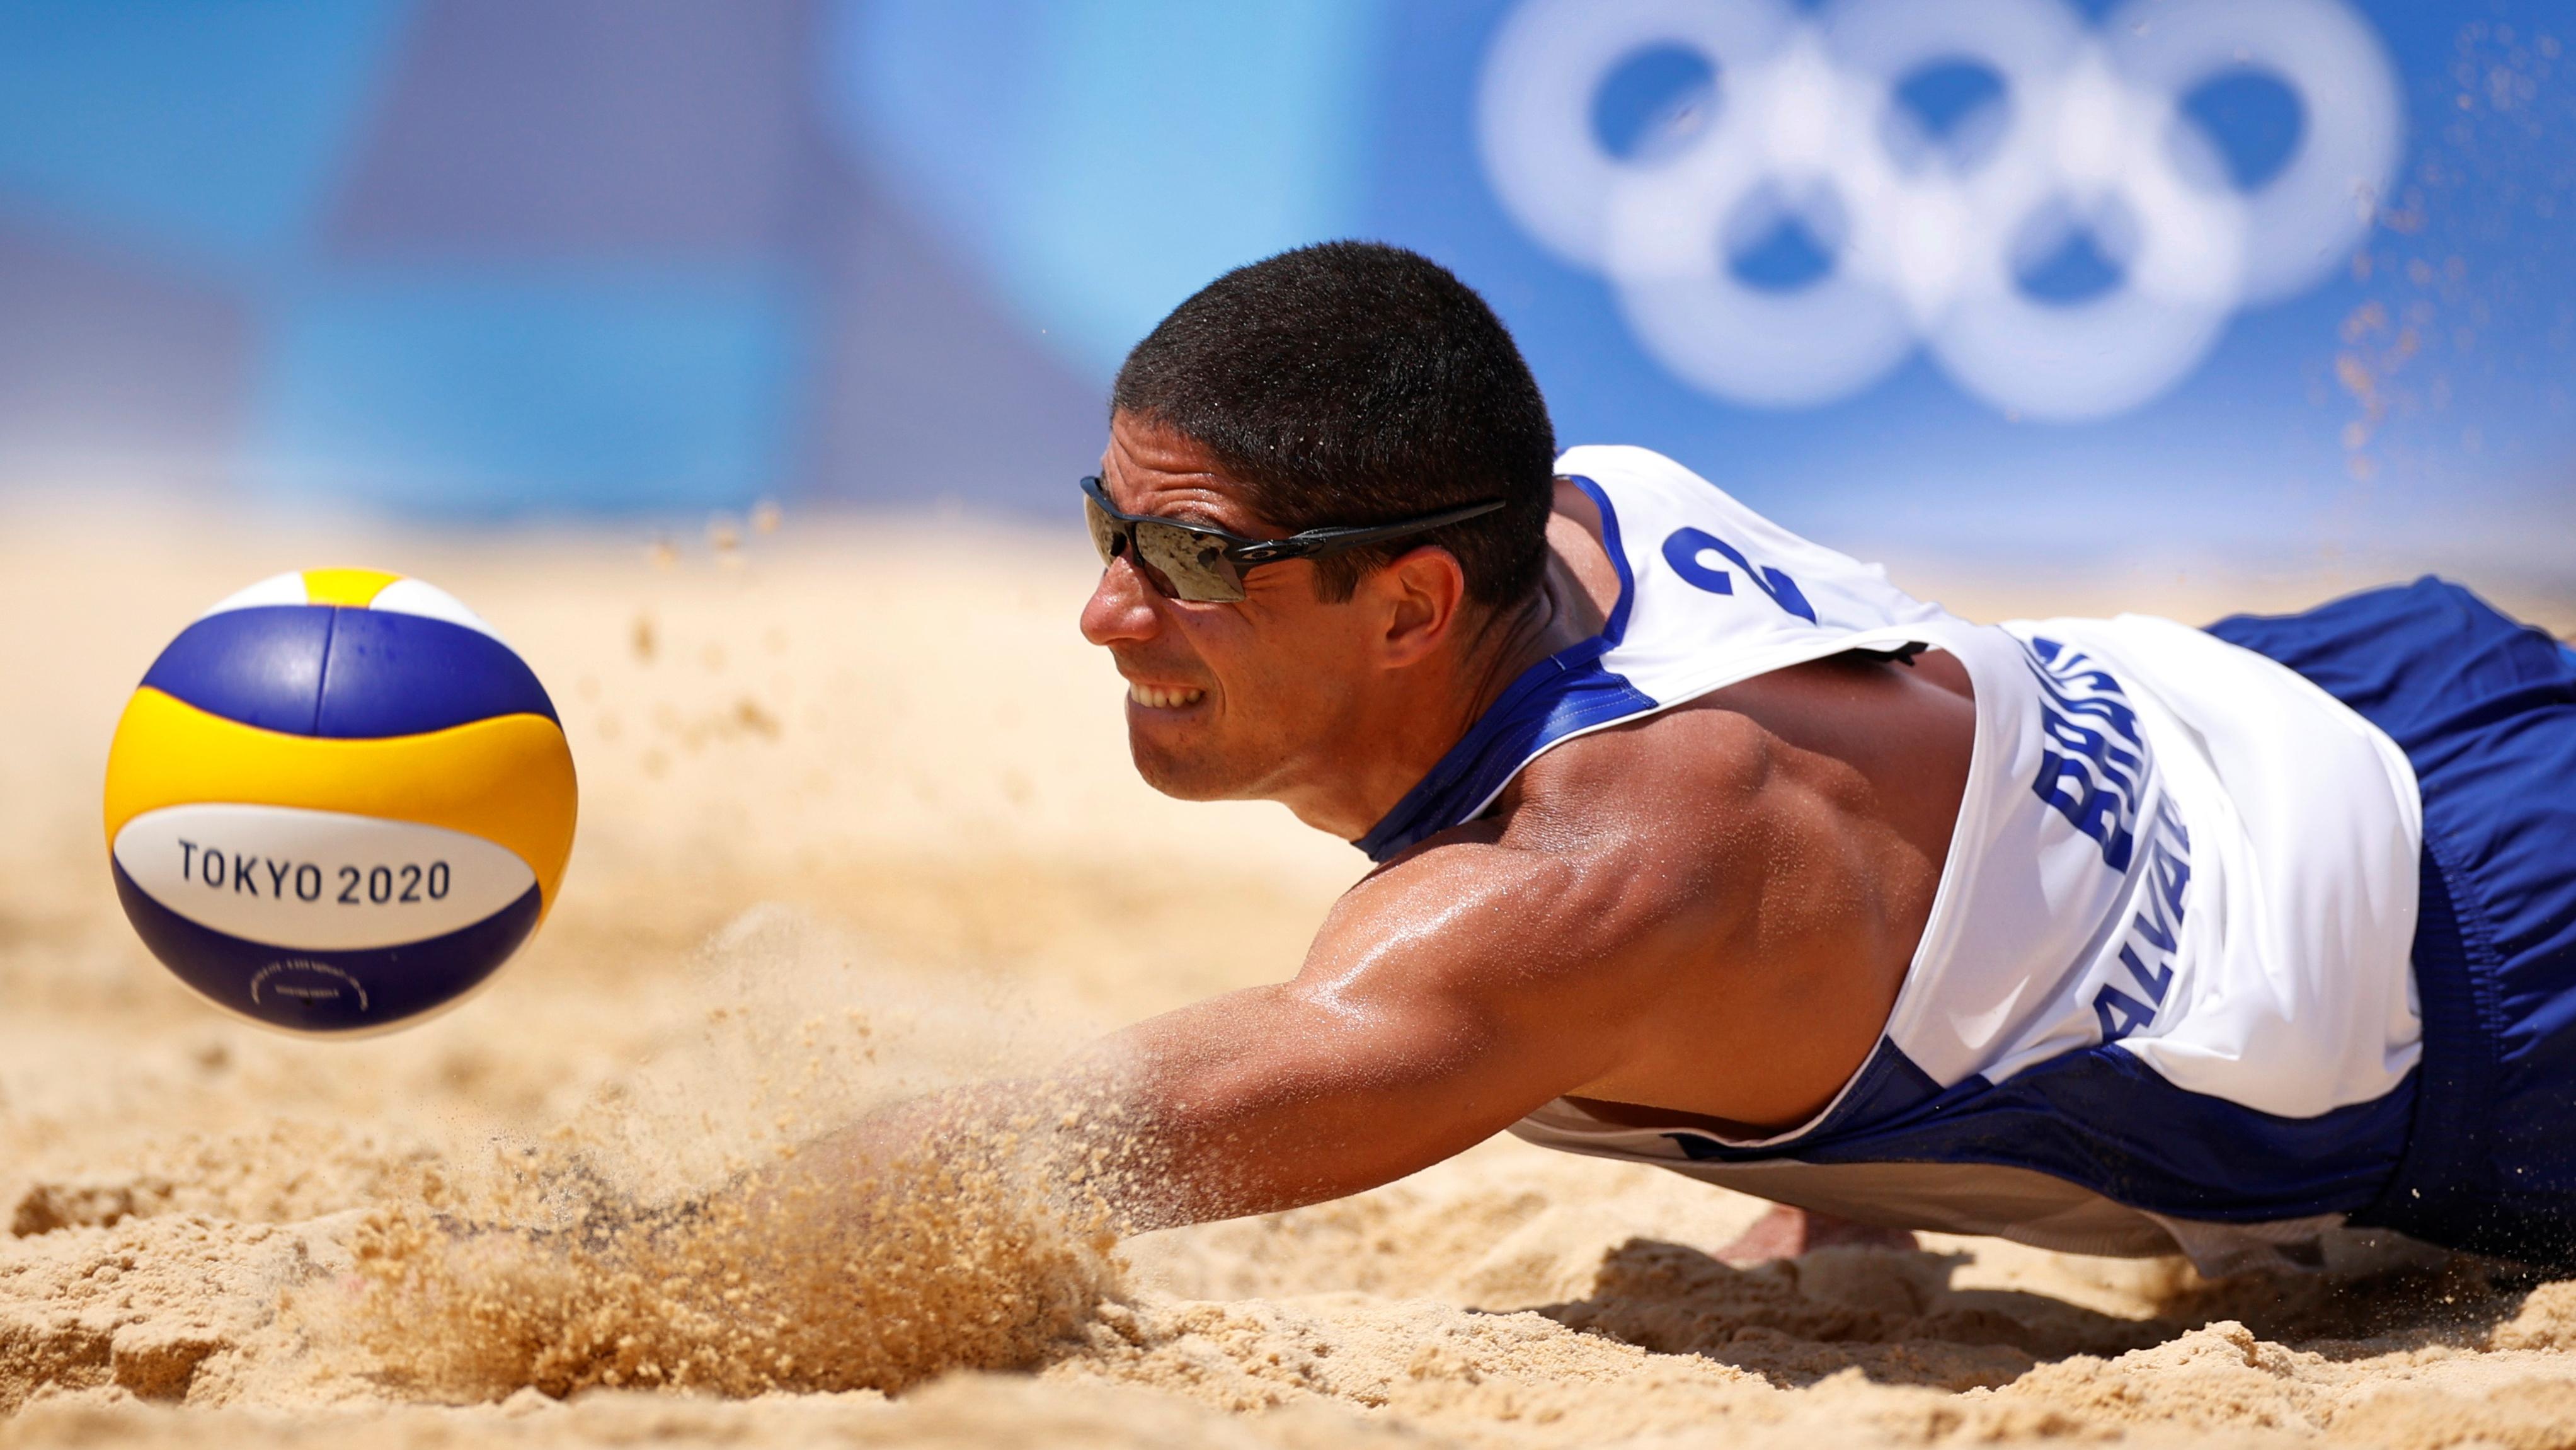 Tokyo 2020 Olympics - Beach Volleyball - Men - Pool D - Brazil (Alison/Alvaro Filho) - Argentina (Azaad/Capogrosso) - Shiokaze Park, Tokyo, Japan - July 24, 2021. Alvaro Filho of Brazil in action. REUTERS/John Sibley